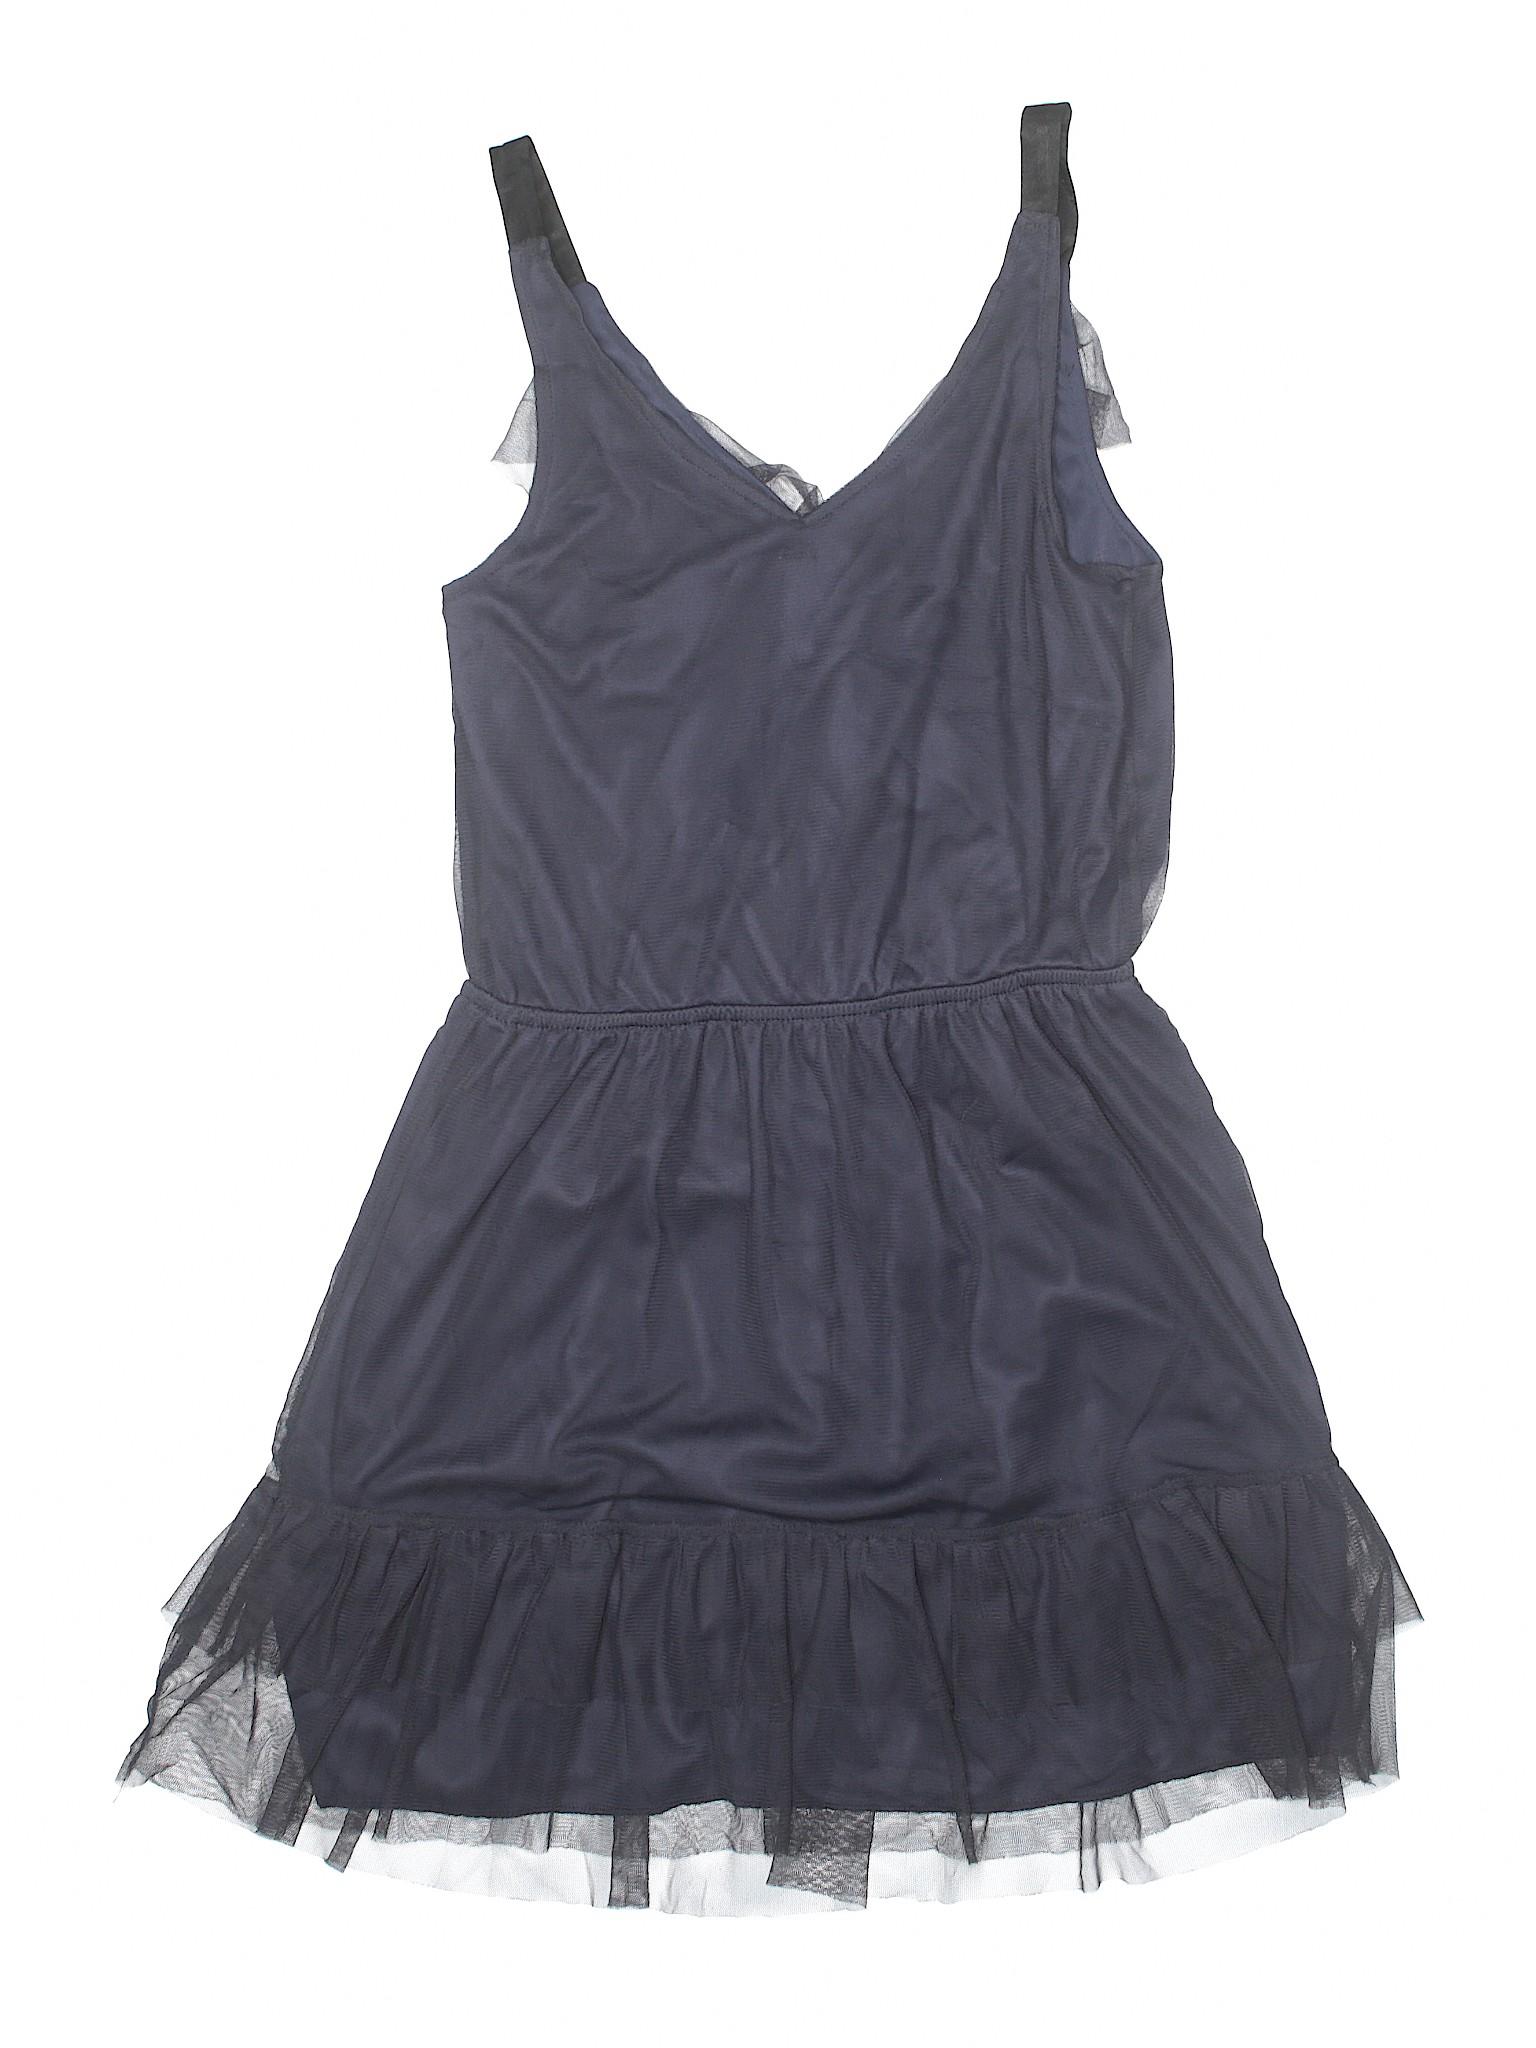 Boutique Xhilaration Casual Casual winter winter Boutique Boutique Dress winter Dress Xhilaration wxqaTCII4